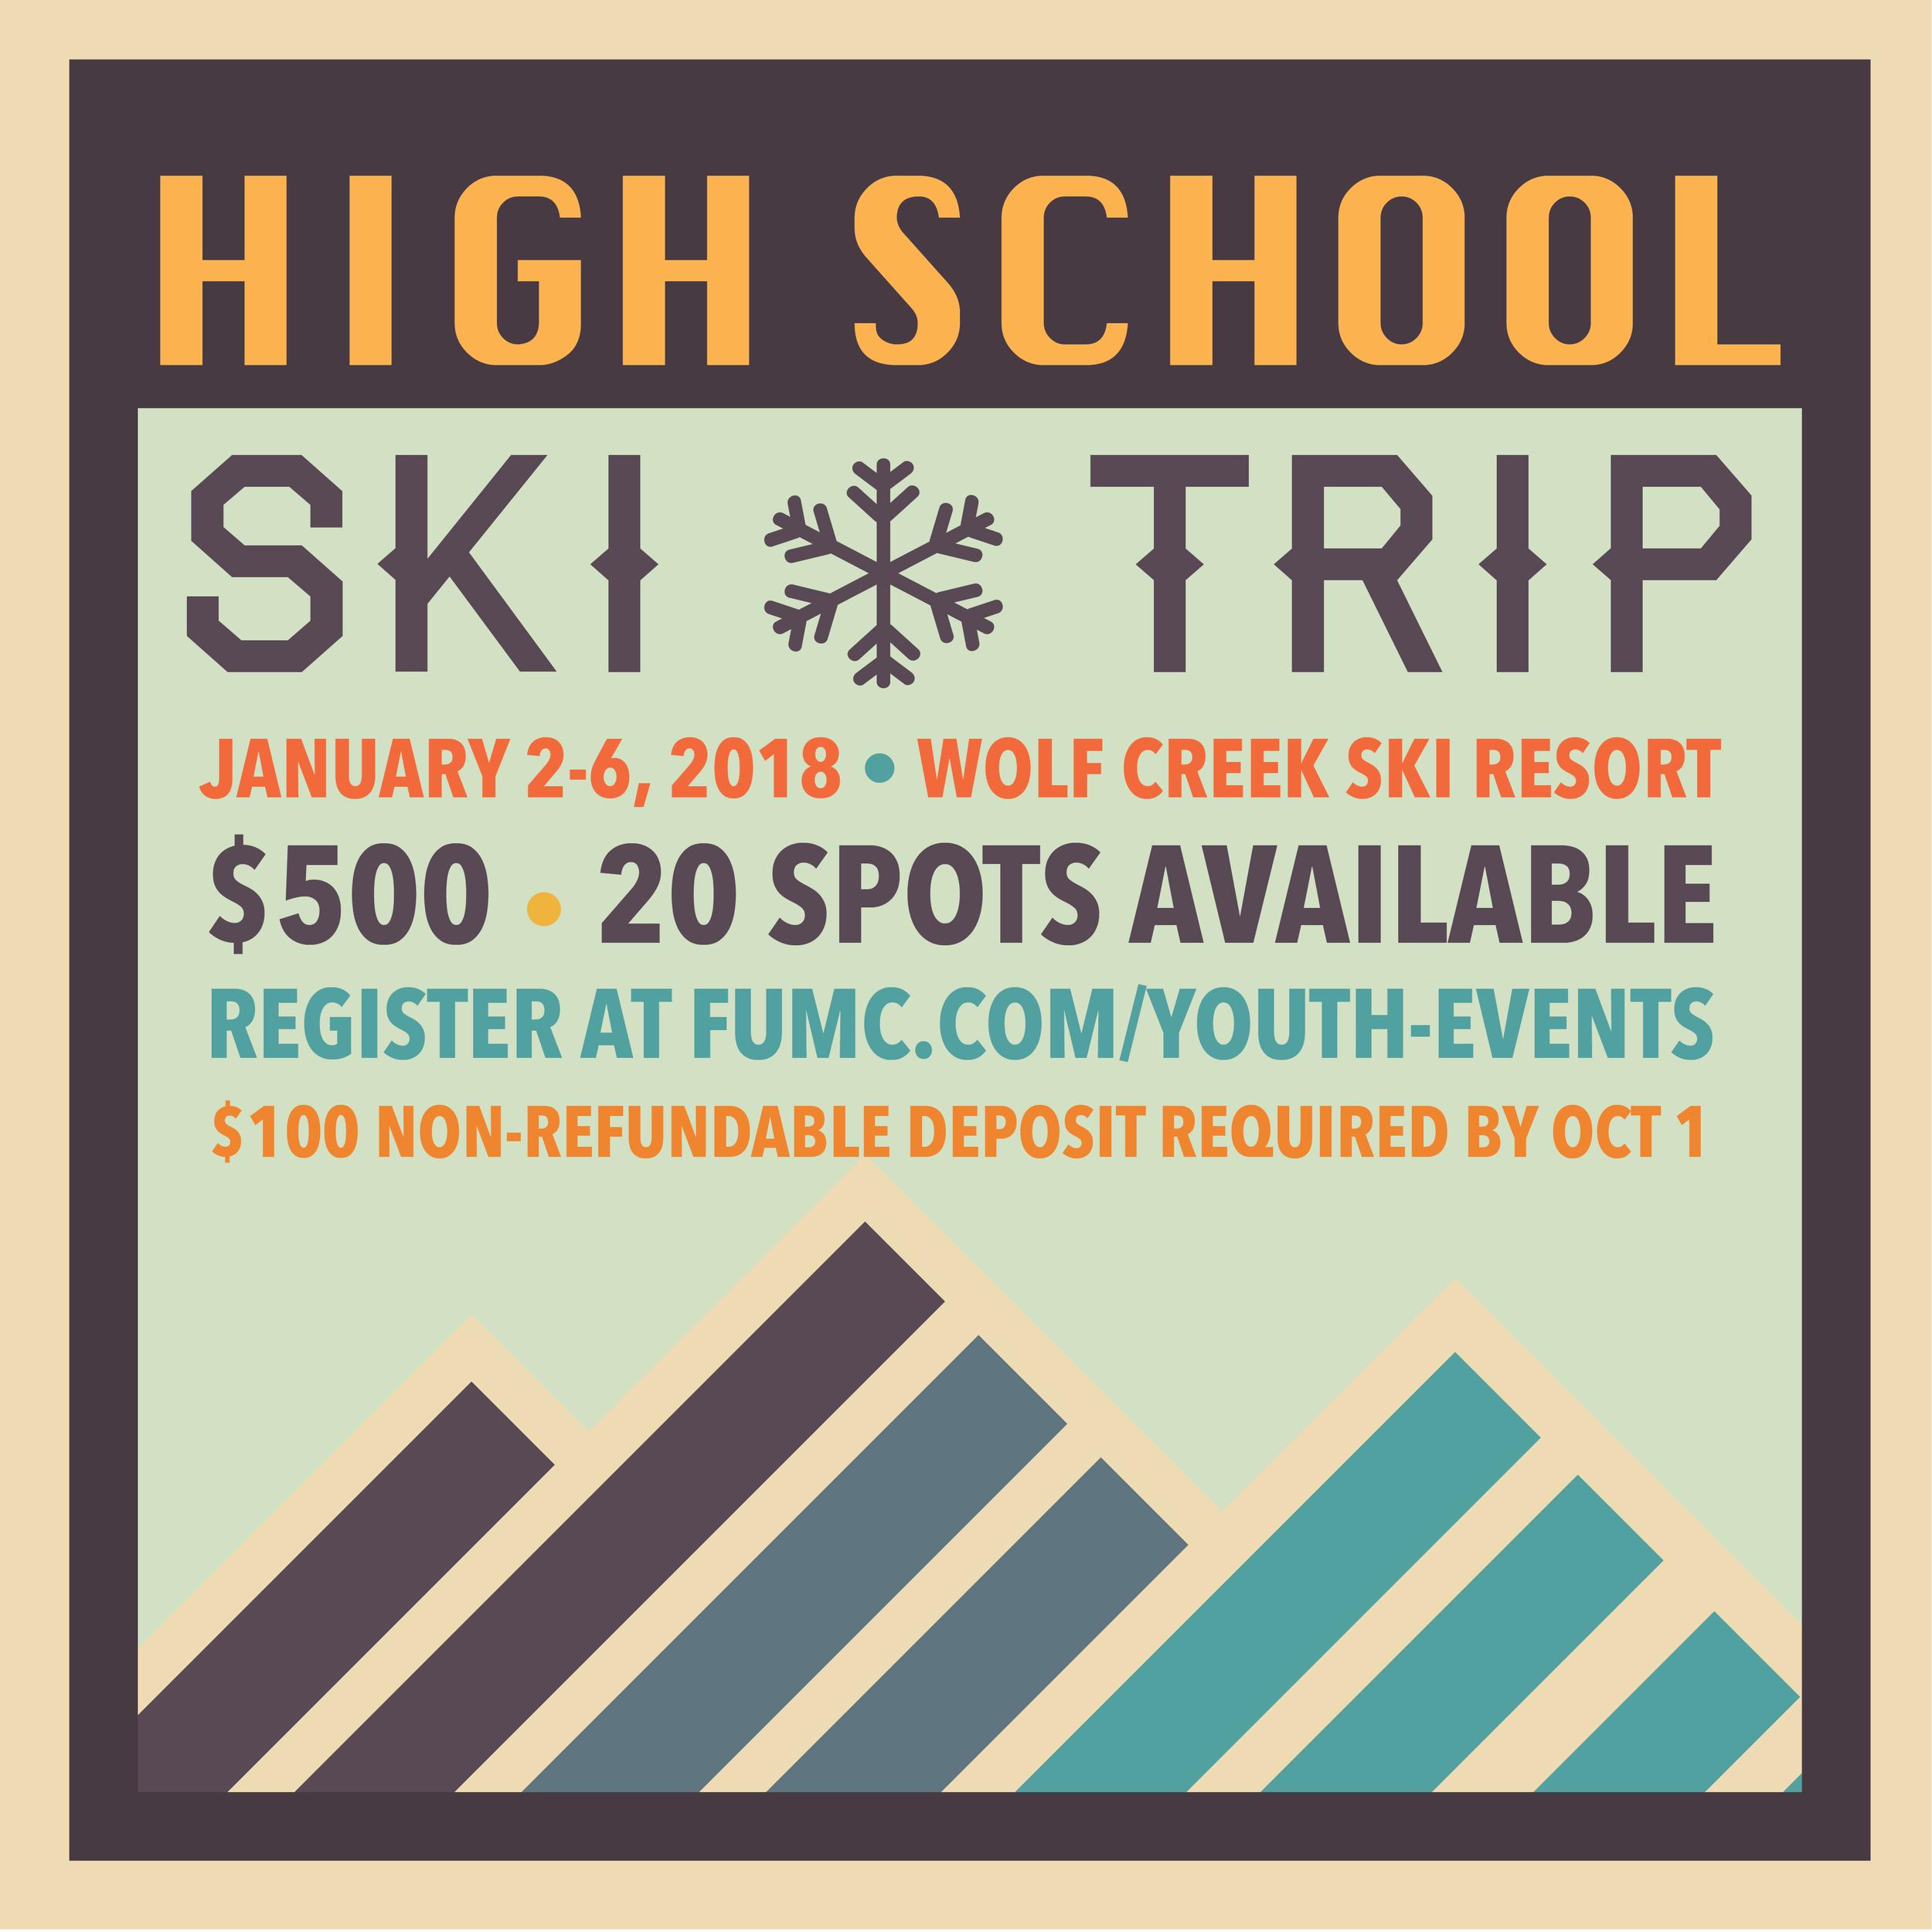 High School Ski Trip -01.png